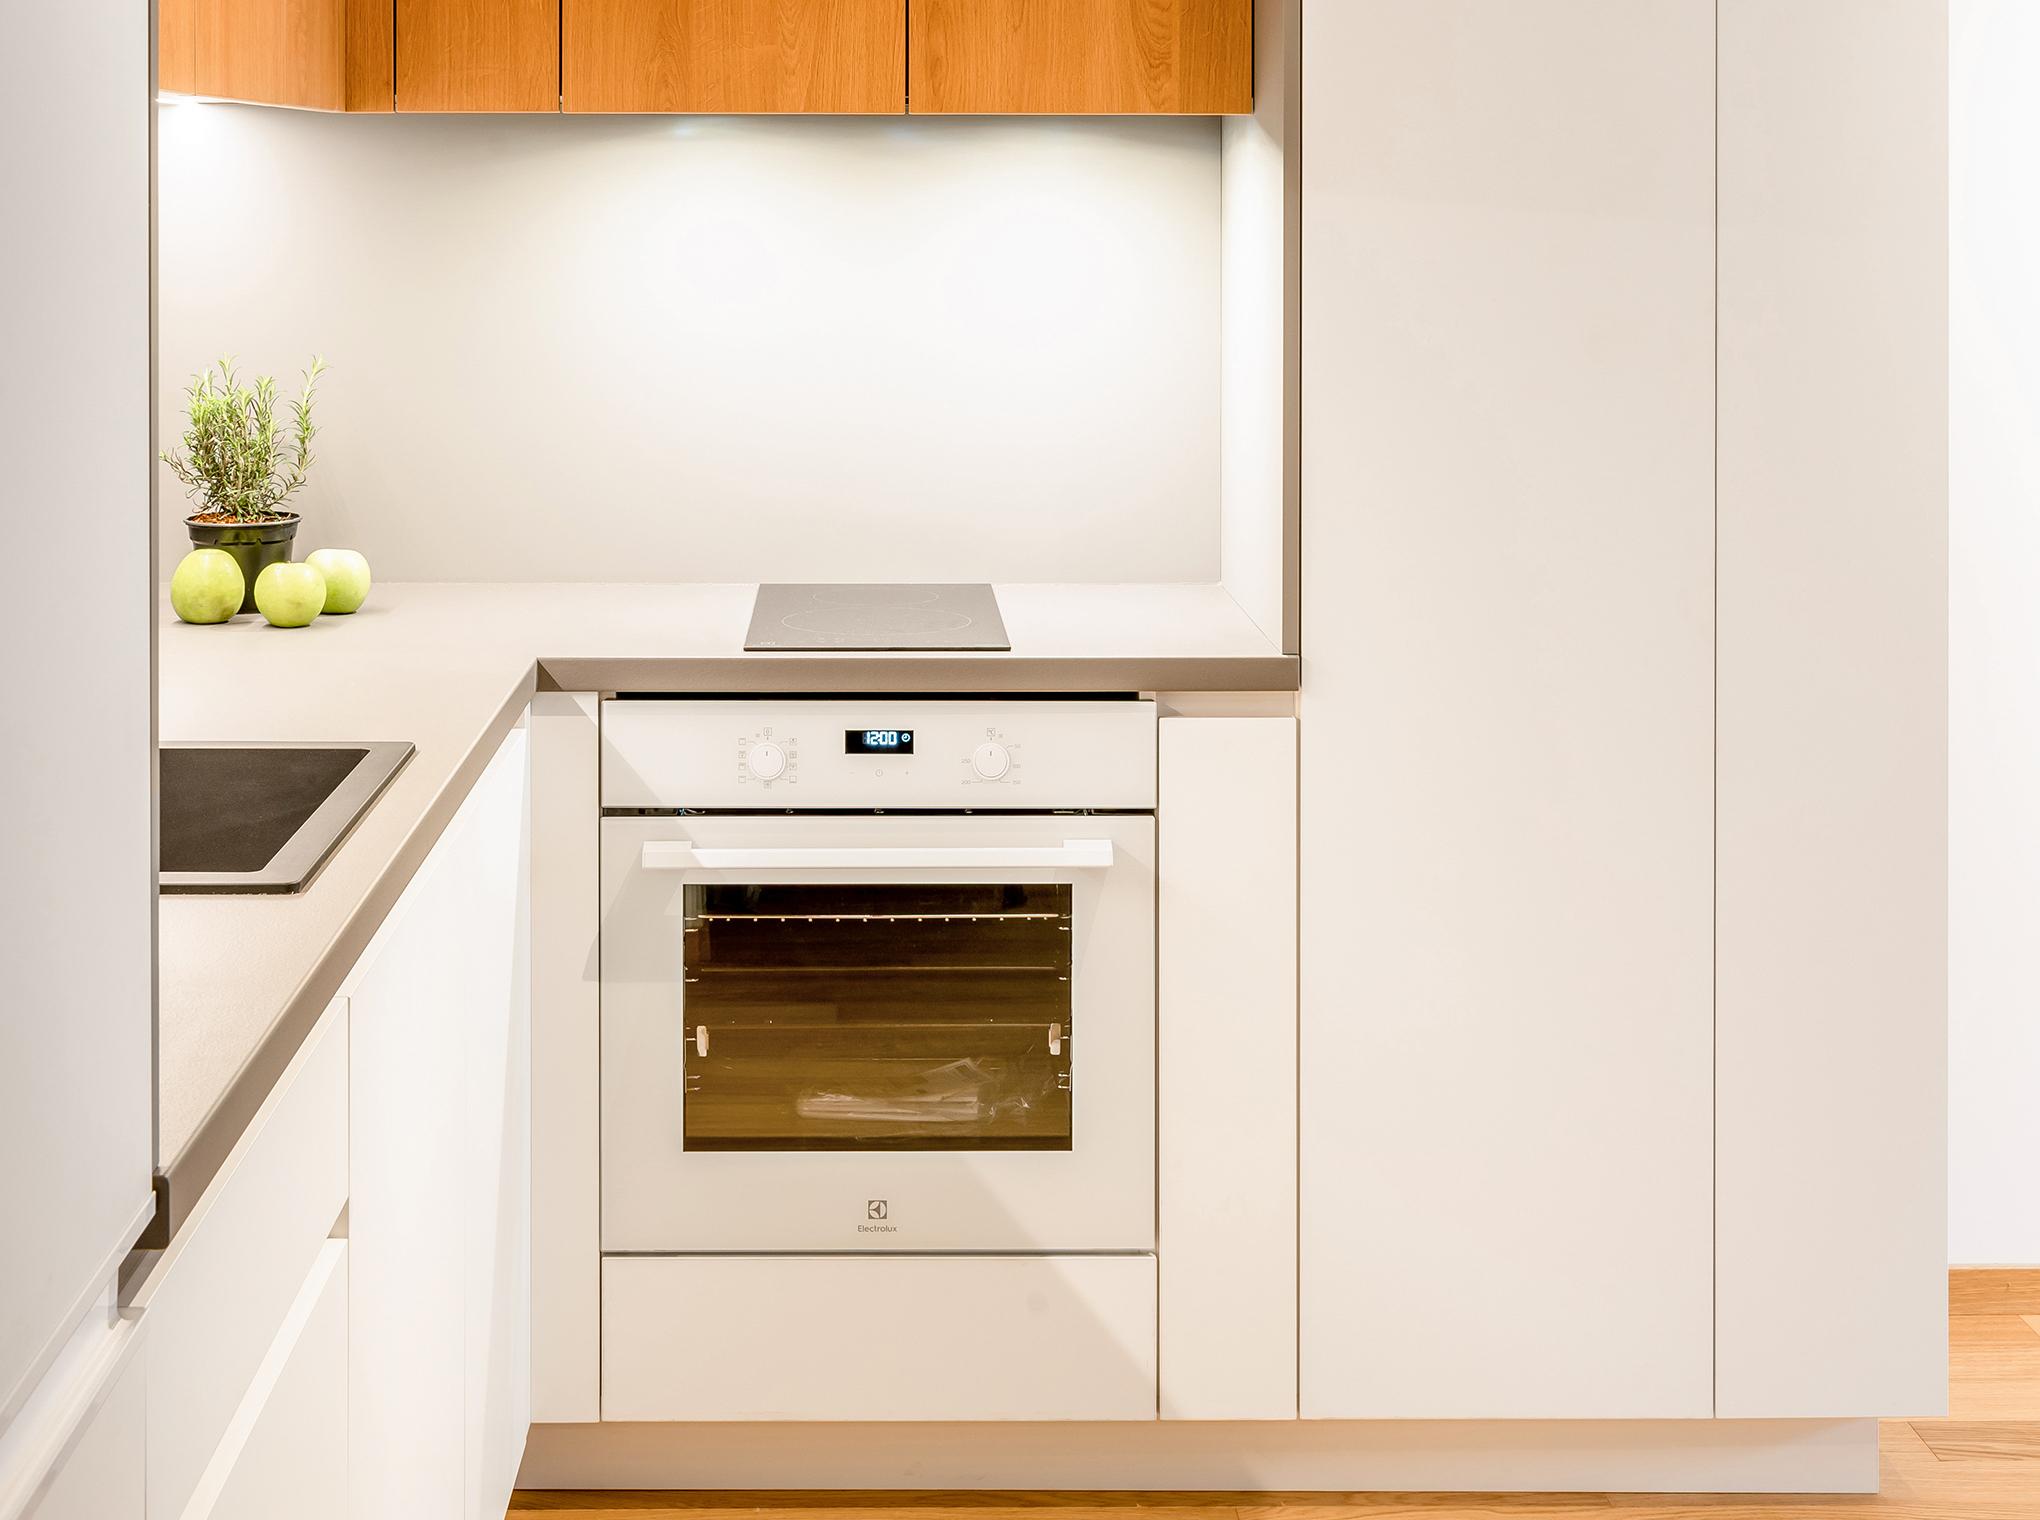 Balta virtuves tehnika - Alberomebeles.lv